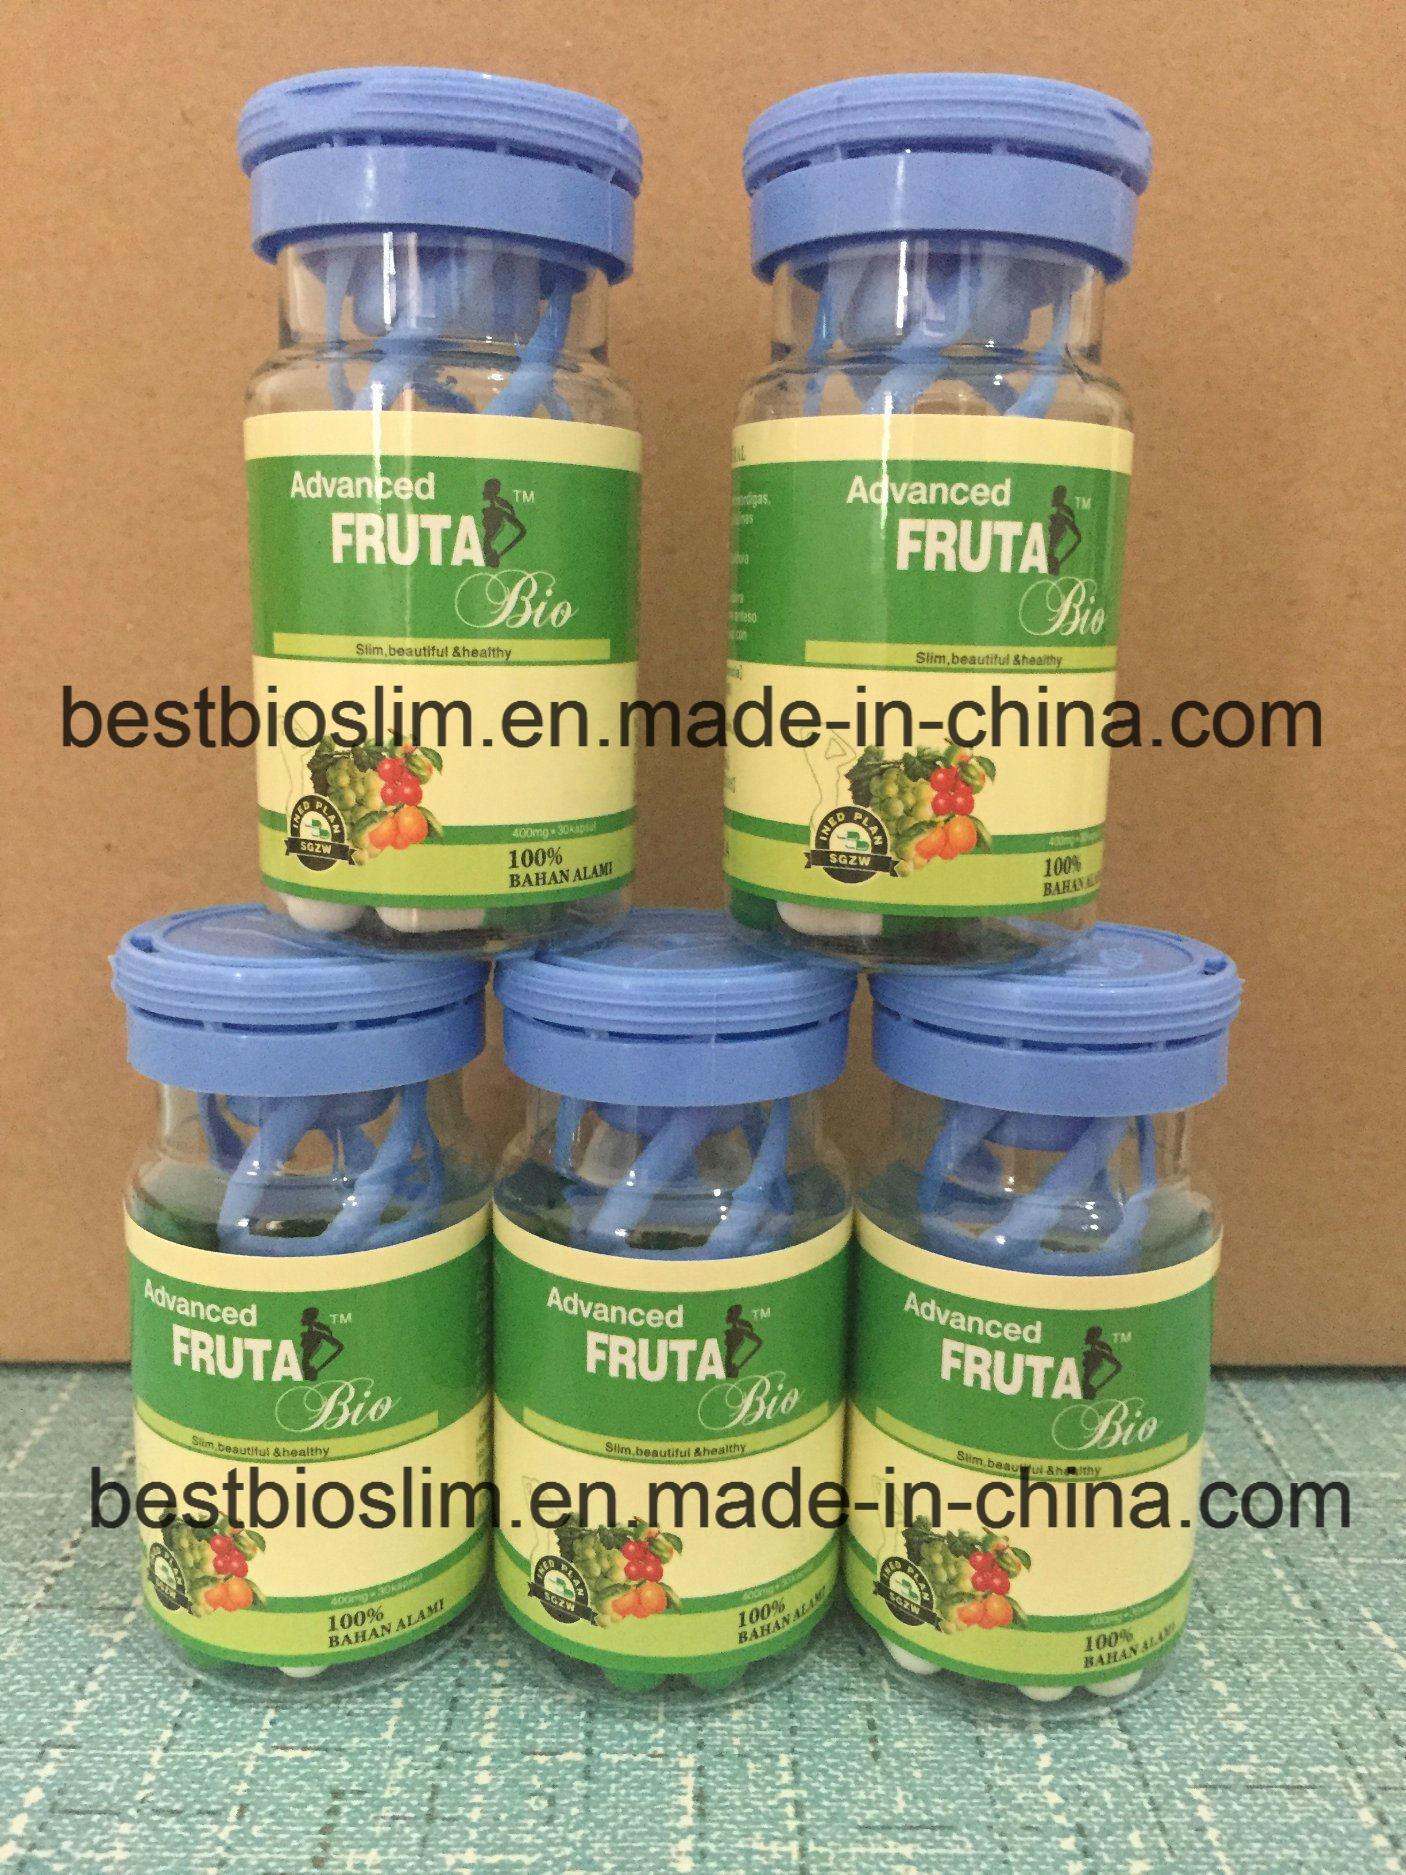 Fruta Bio Bottle Slimming Advance Weightloss Capsules Diet Pills